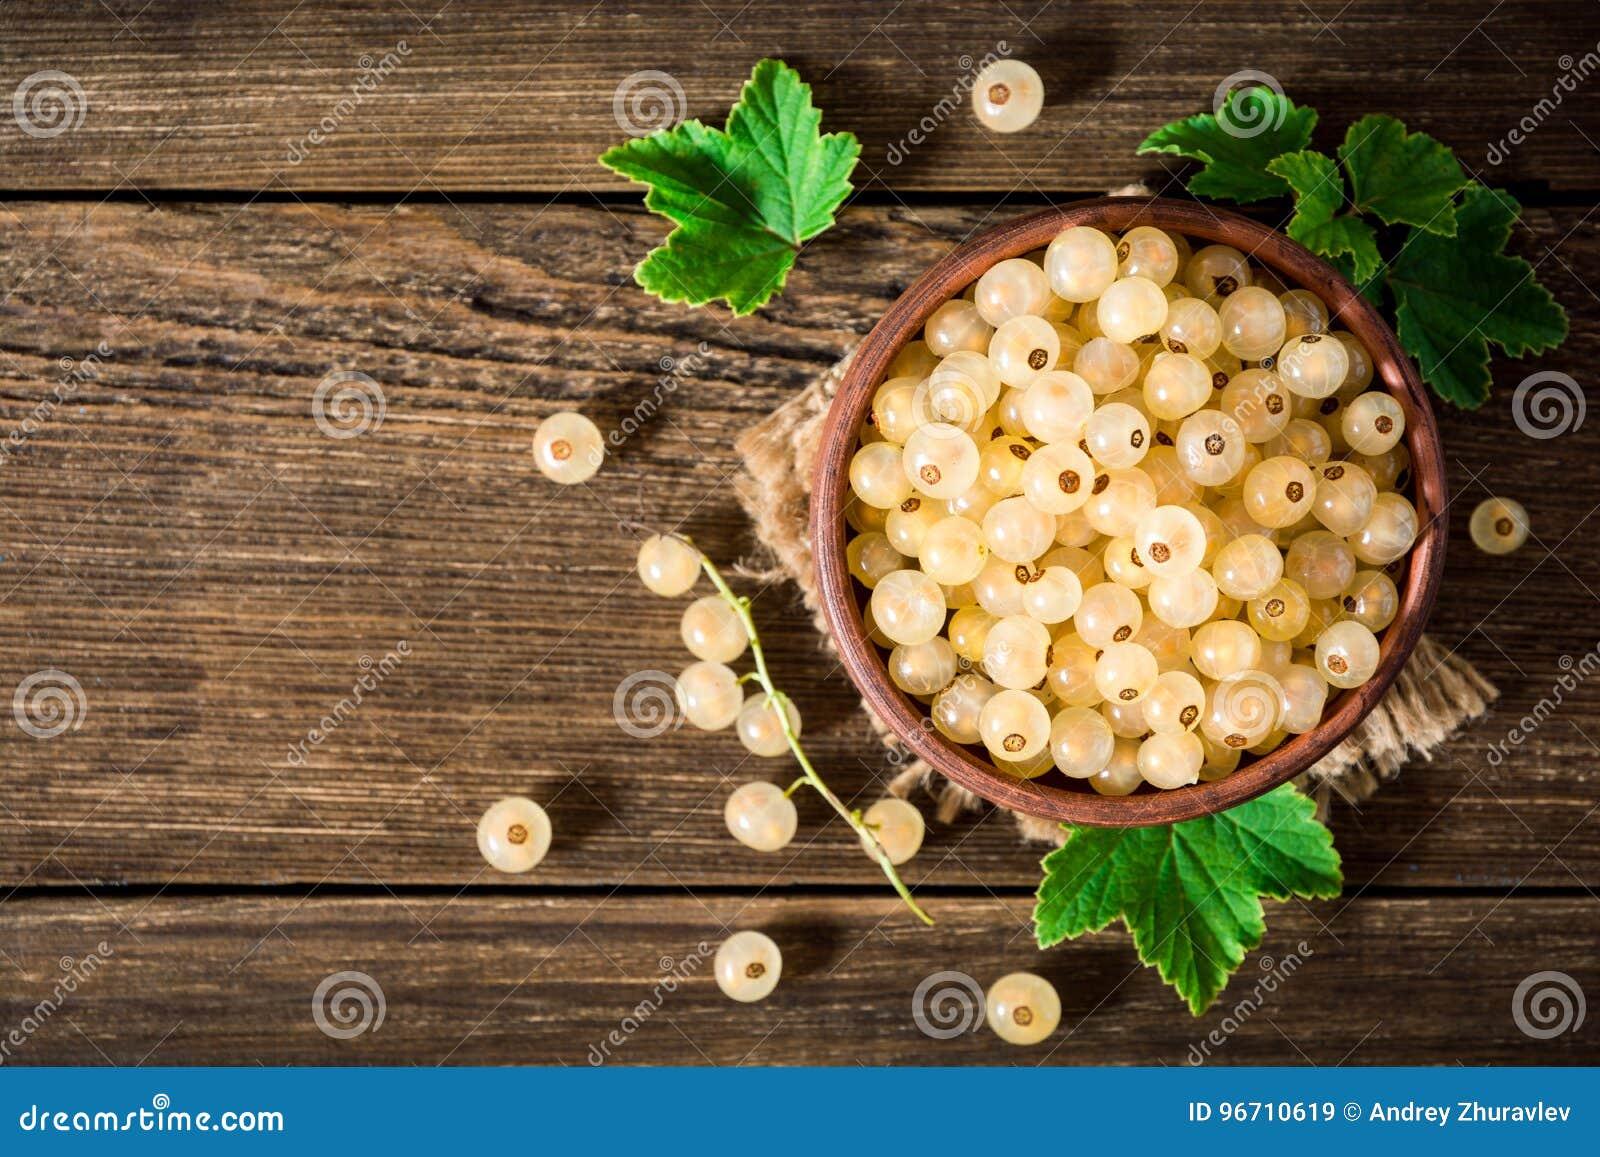 Fresh white currant in ceramic bowl on dark wooden background.